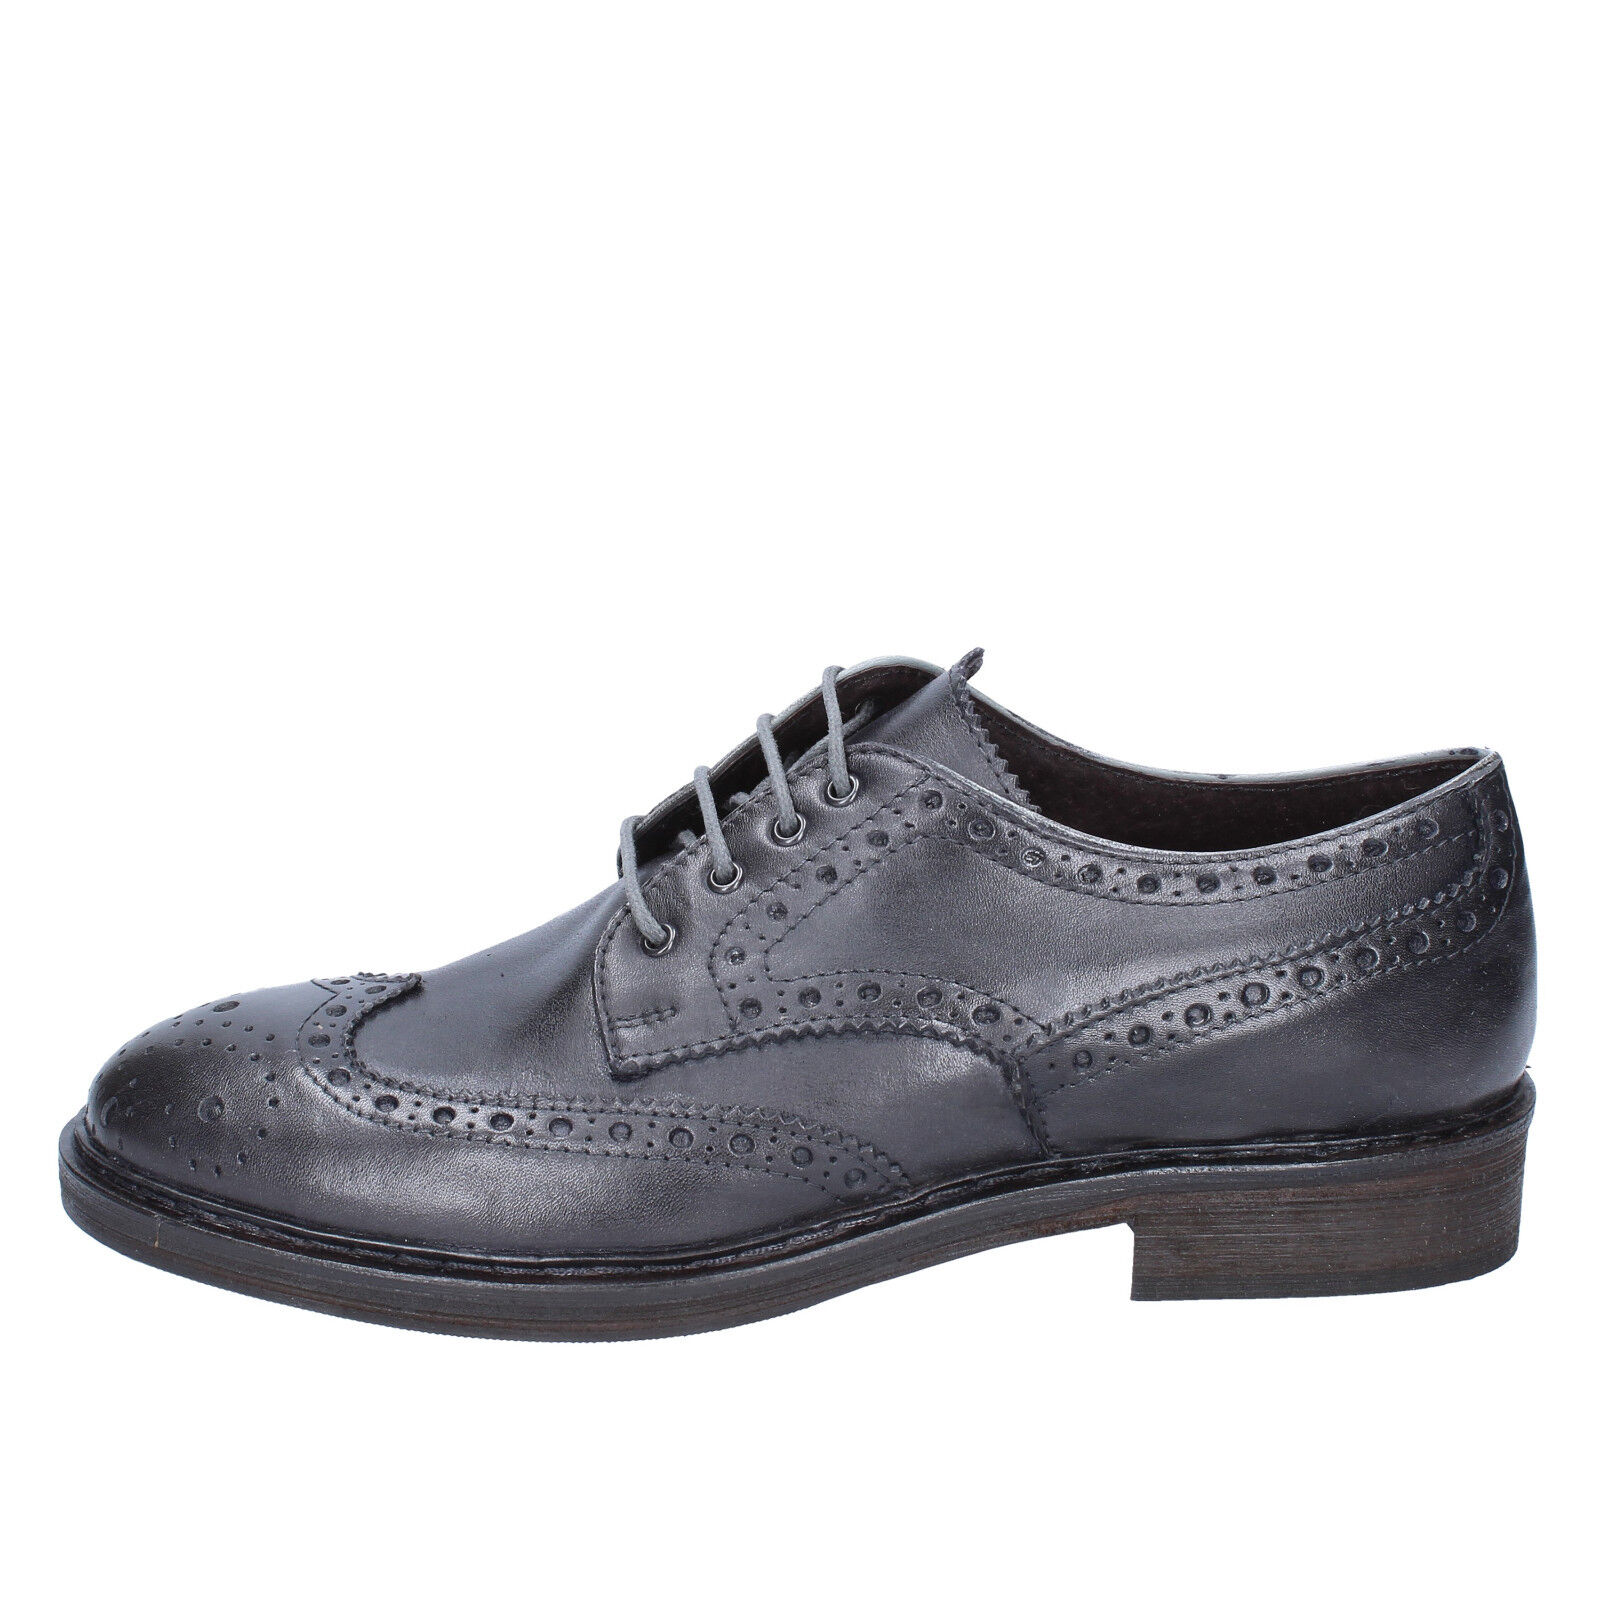 scarpe uomo CESARE grigio MAURIZI 41 EU classiche grigio CESARE pelle BX504-41 76d868